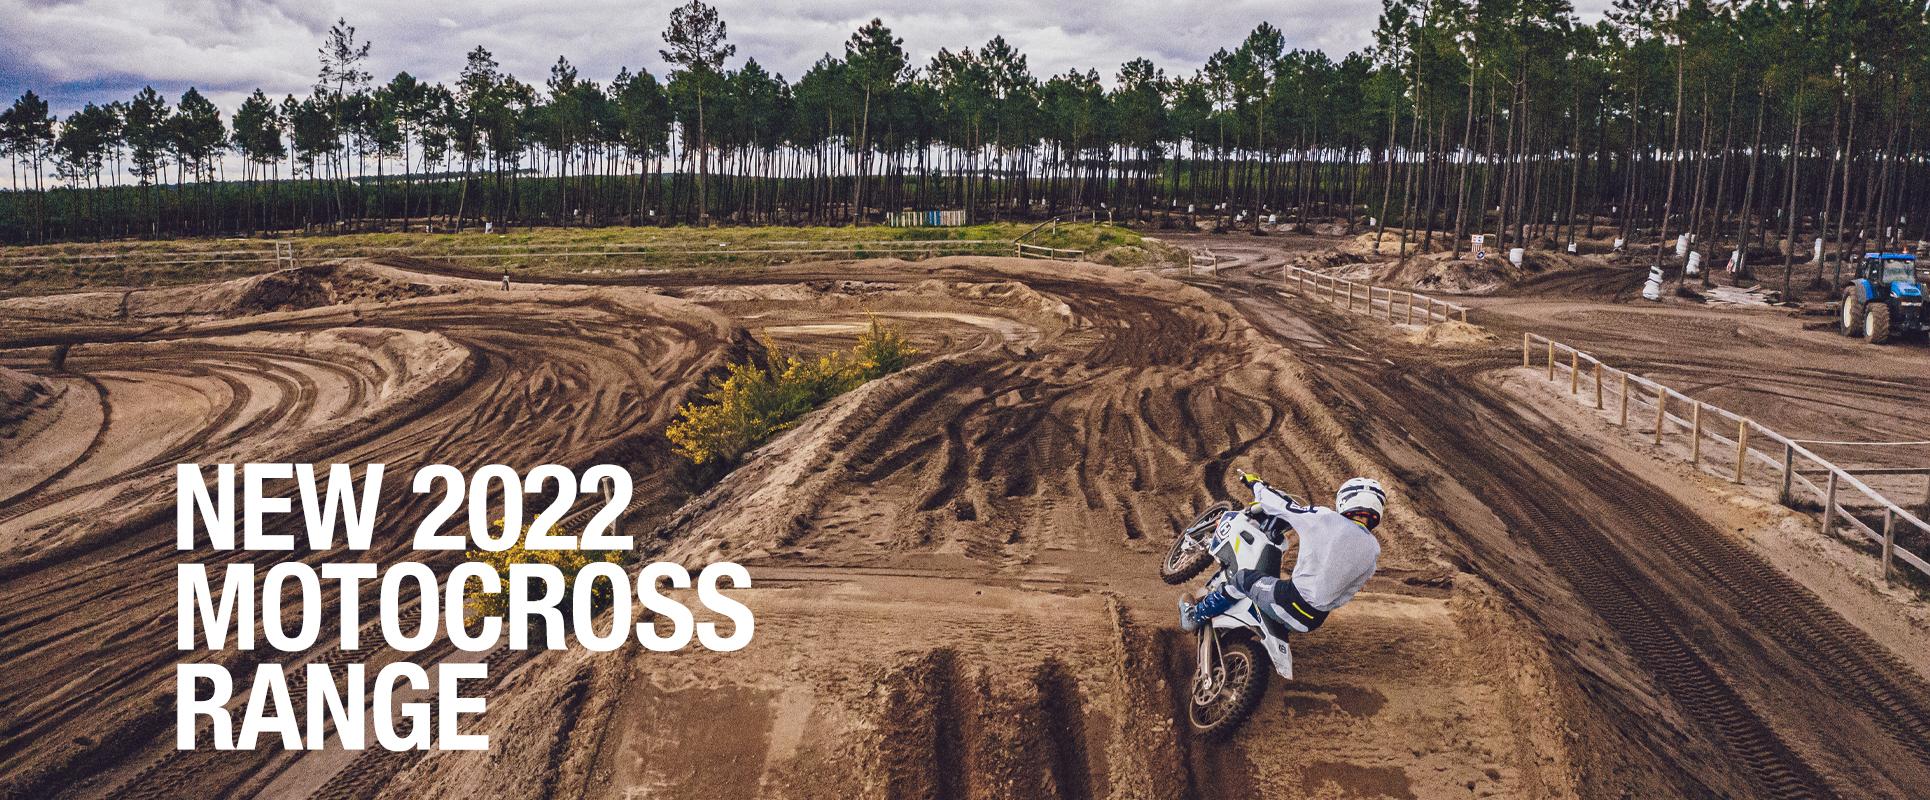 04/05/2021 - Husqvarna Motocross Range 2022